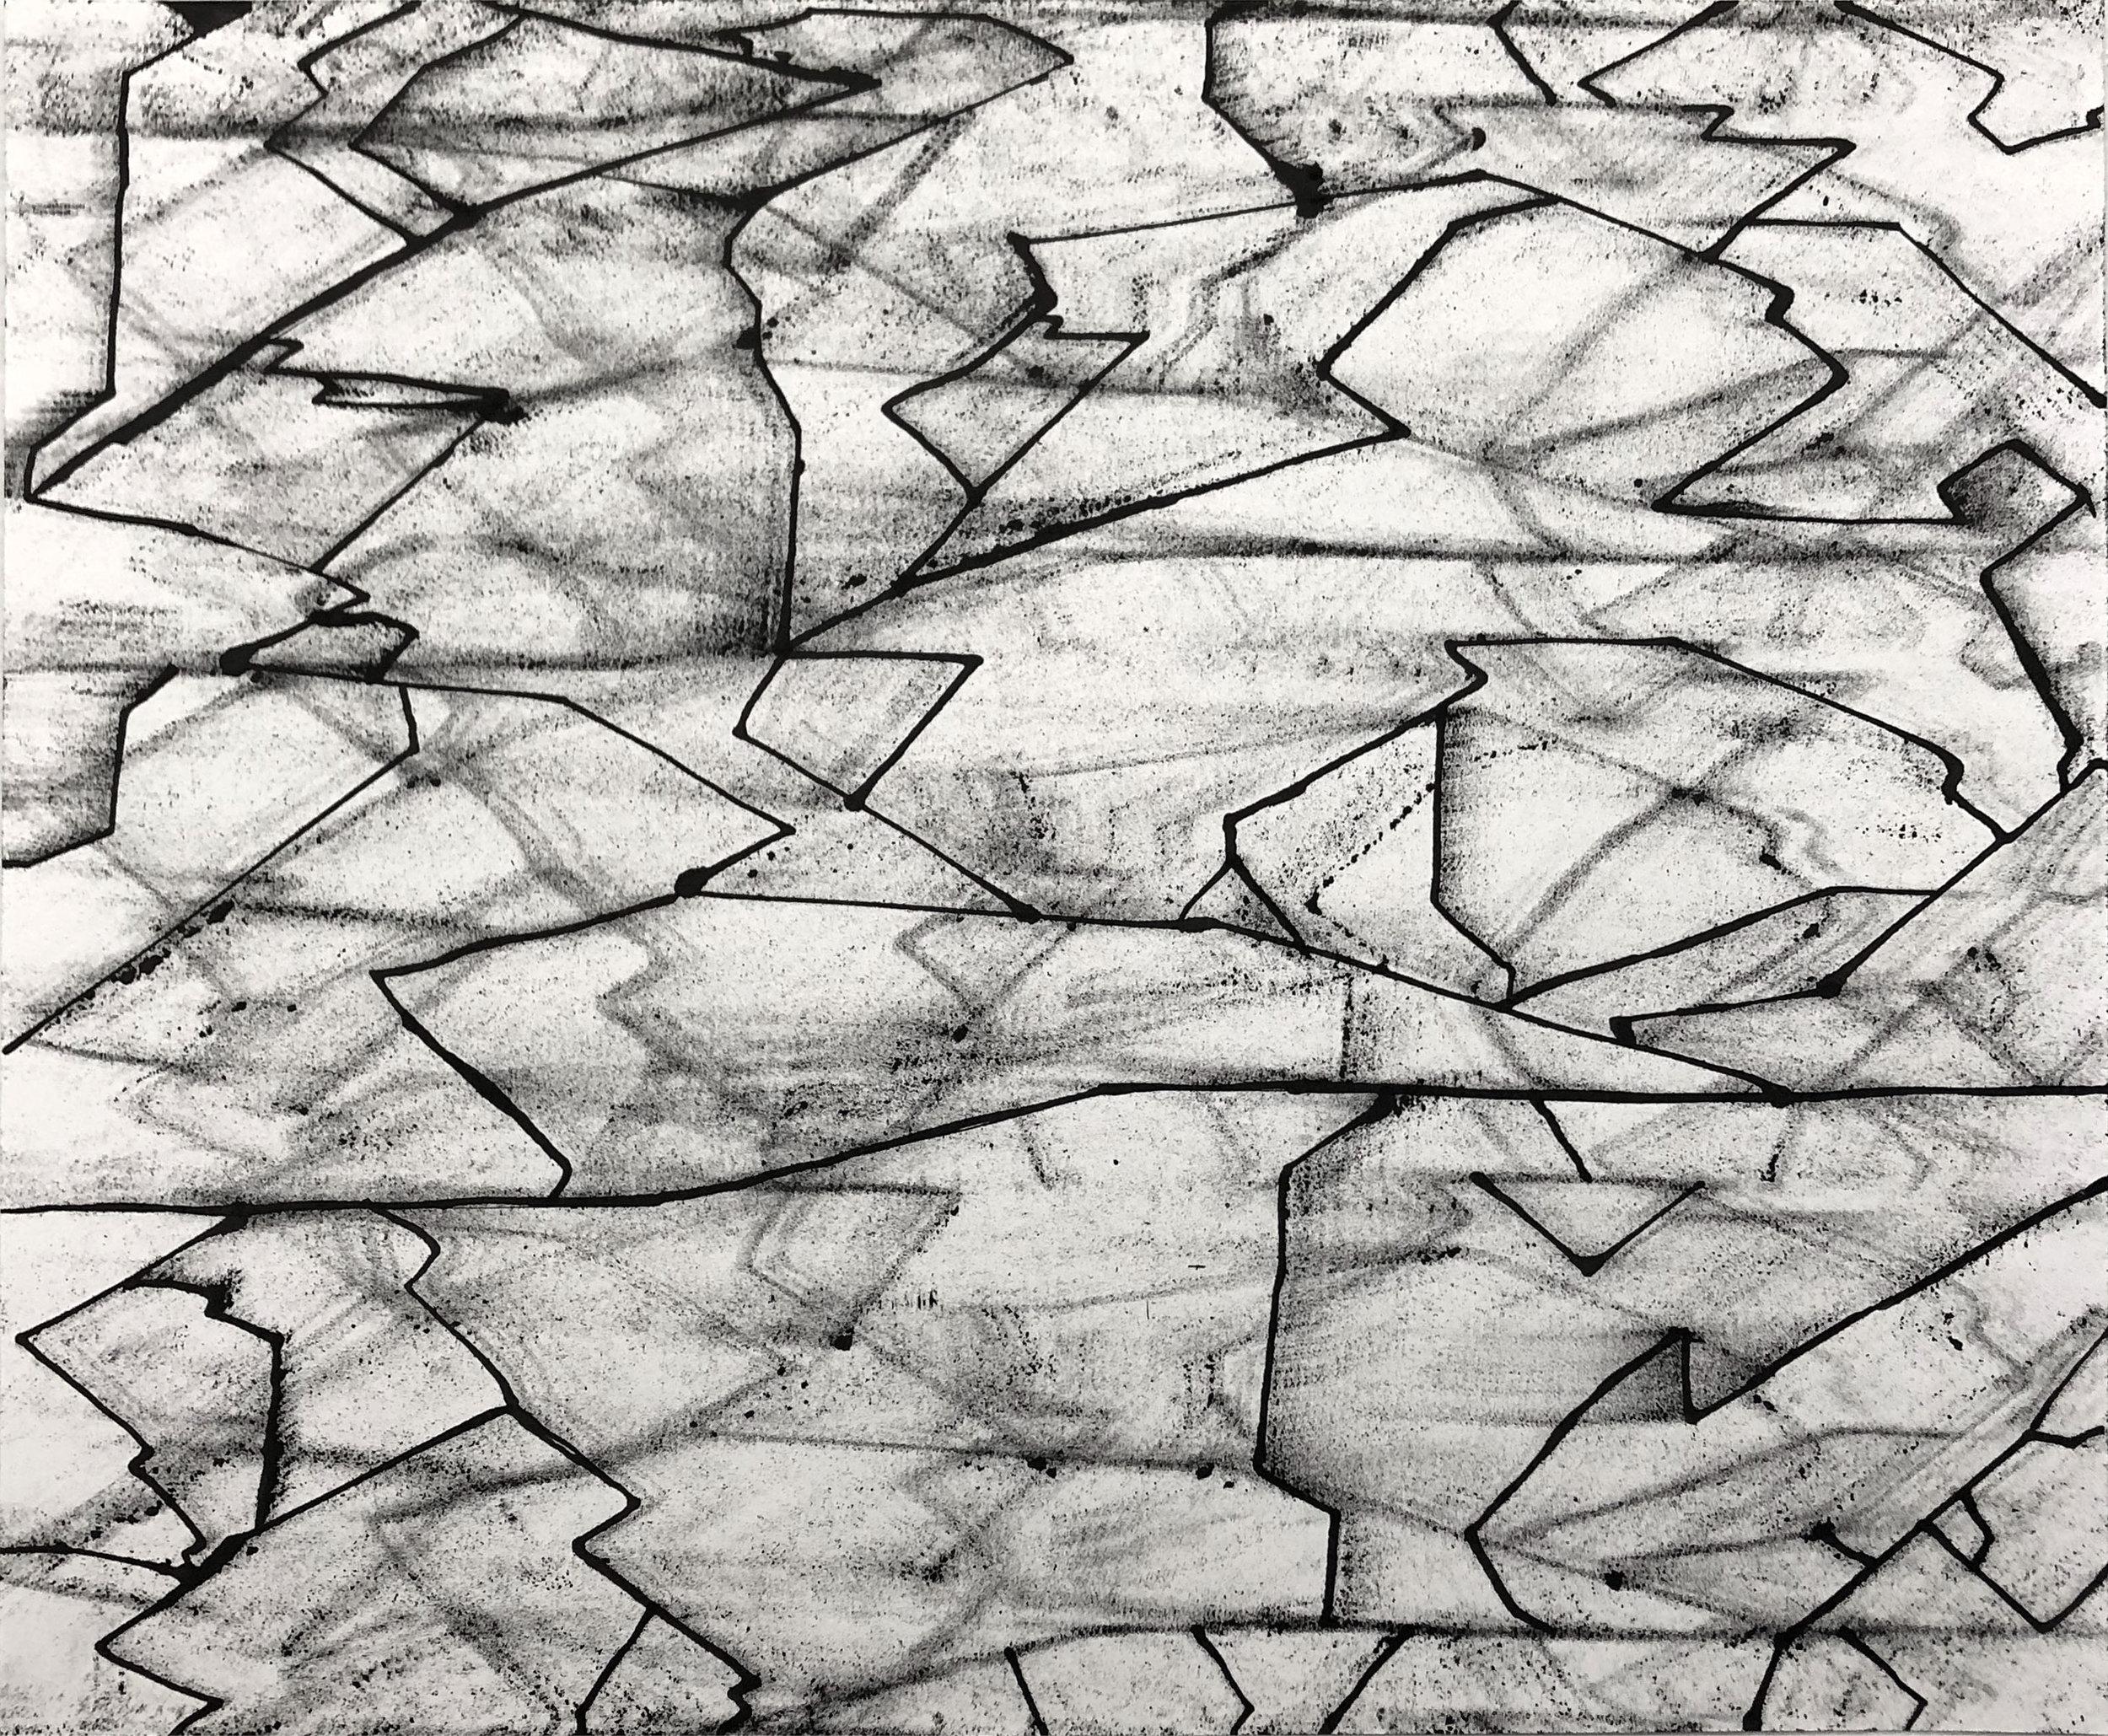 Pleor, 14x17, Ink on Paper